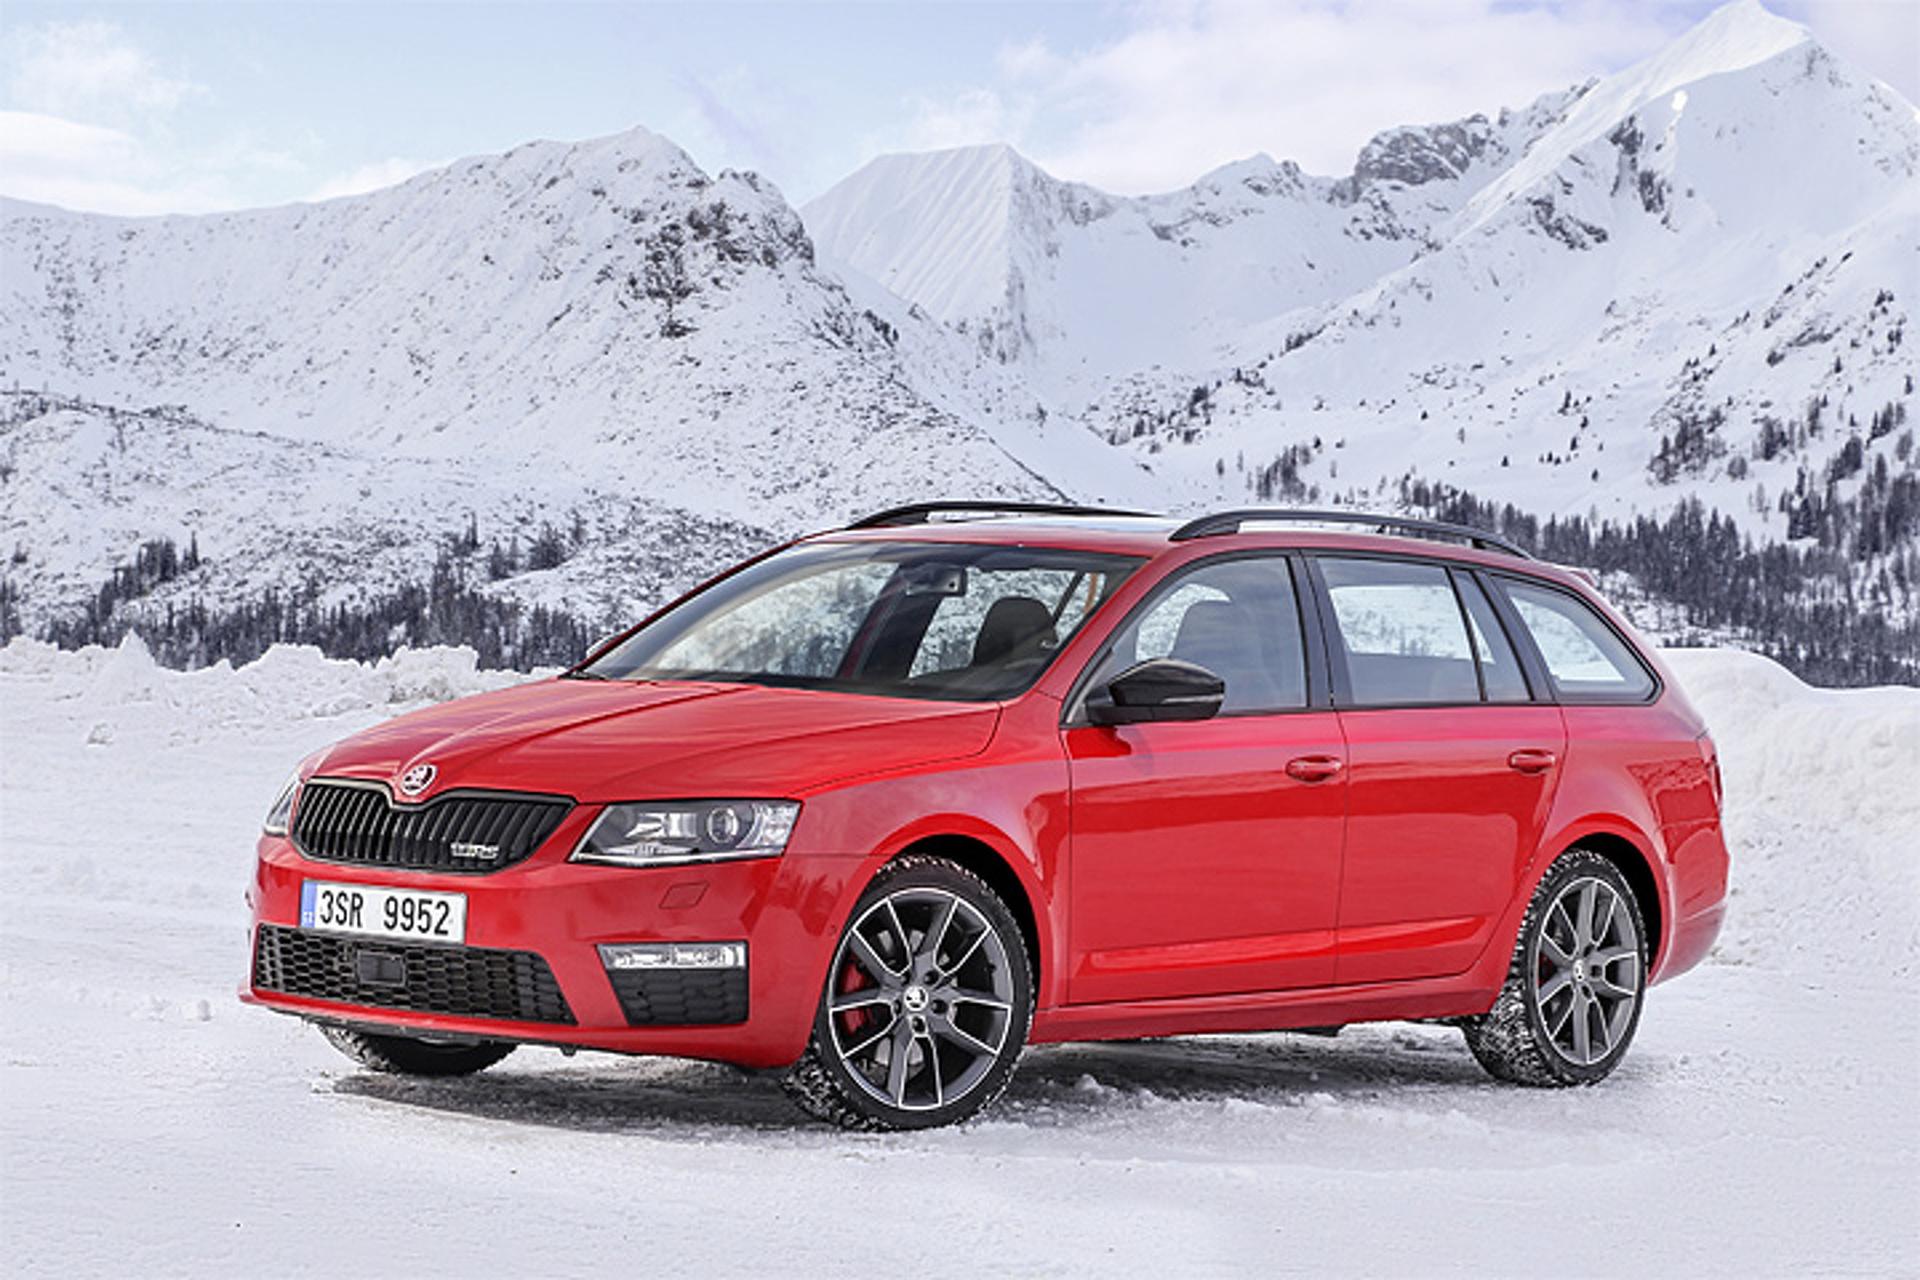 Volkswagen Could Start Selling Skoda Cars in the U.S.